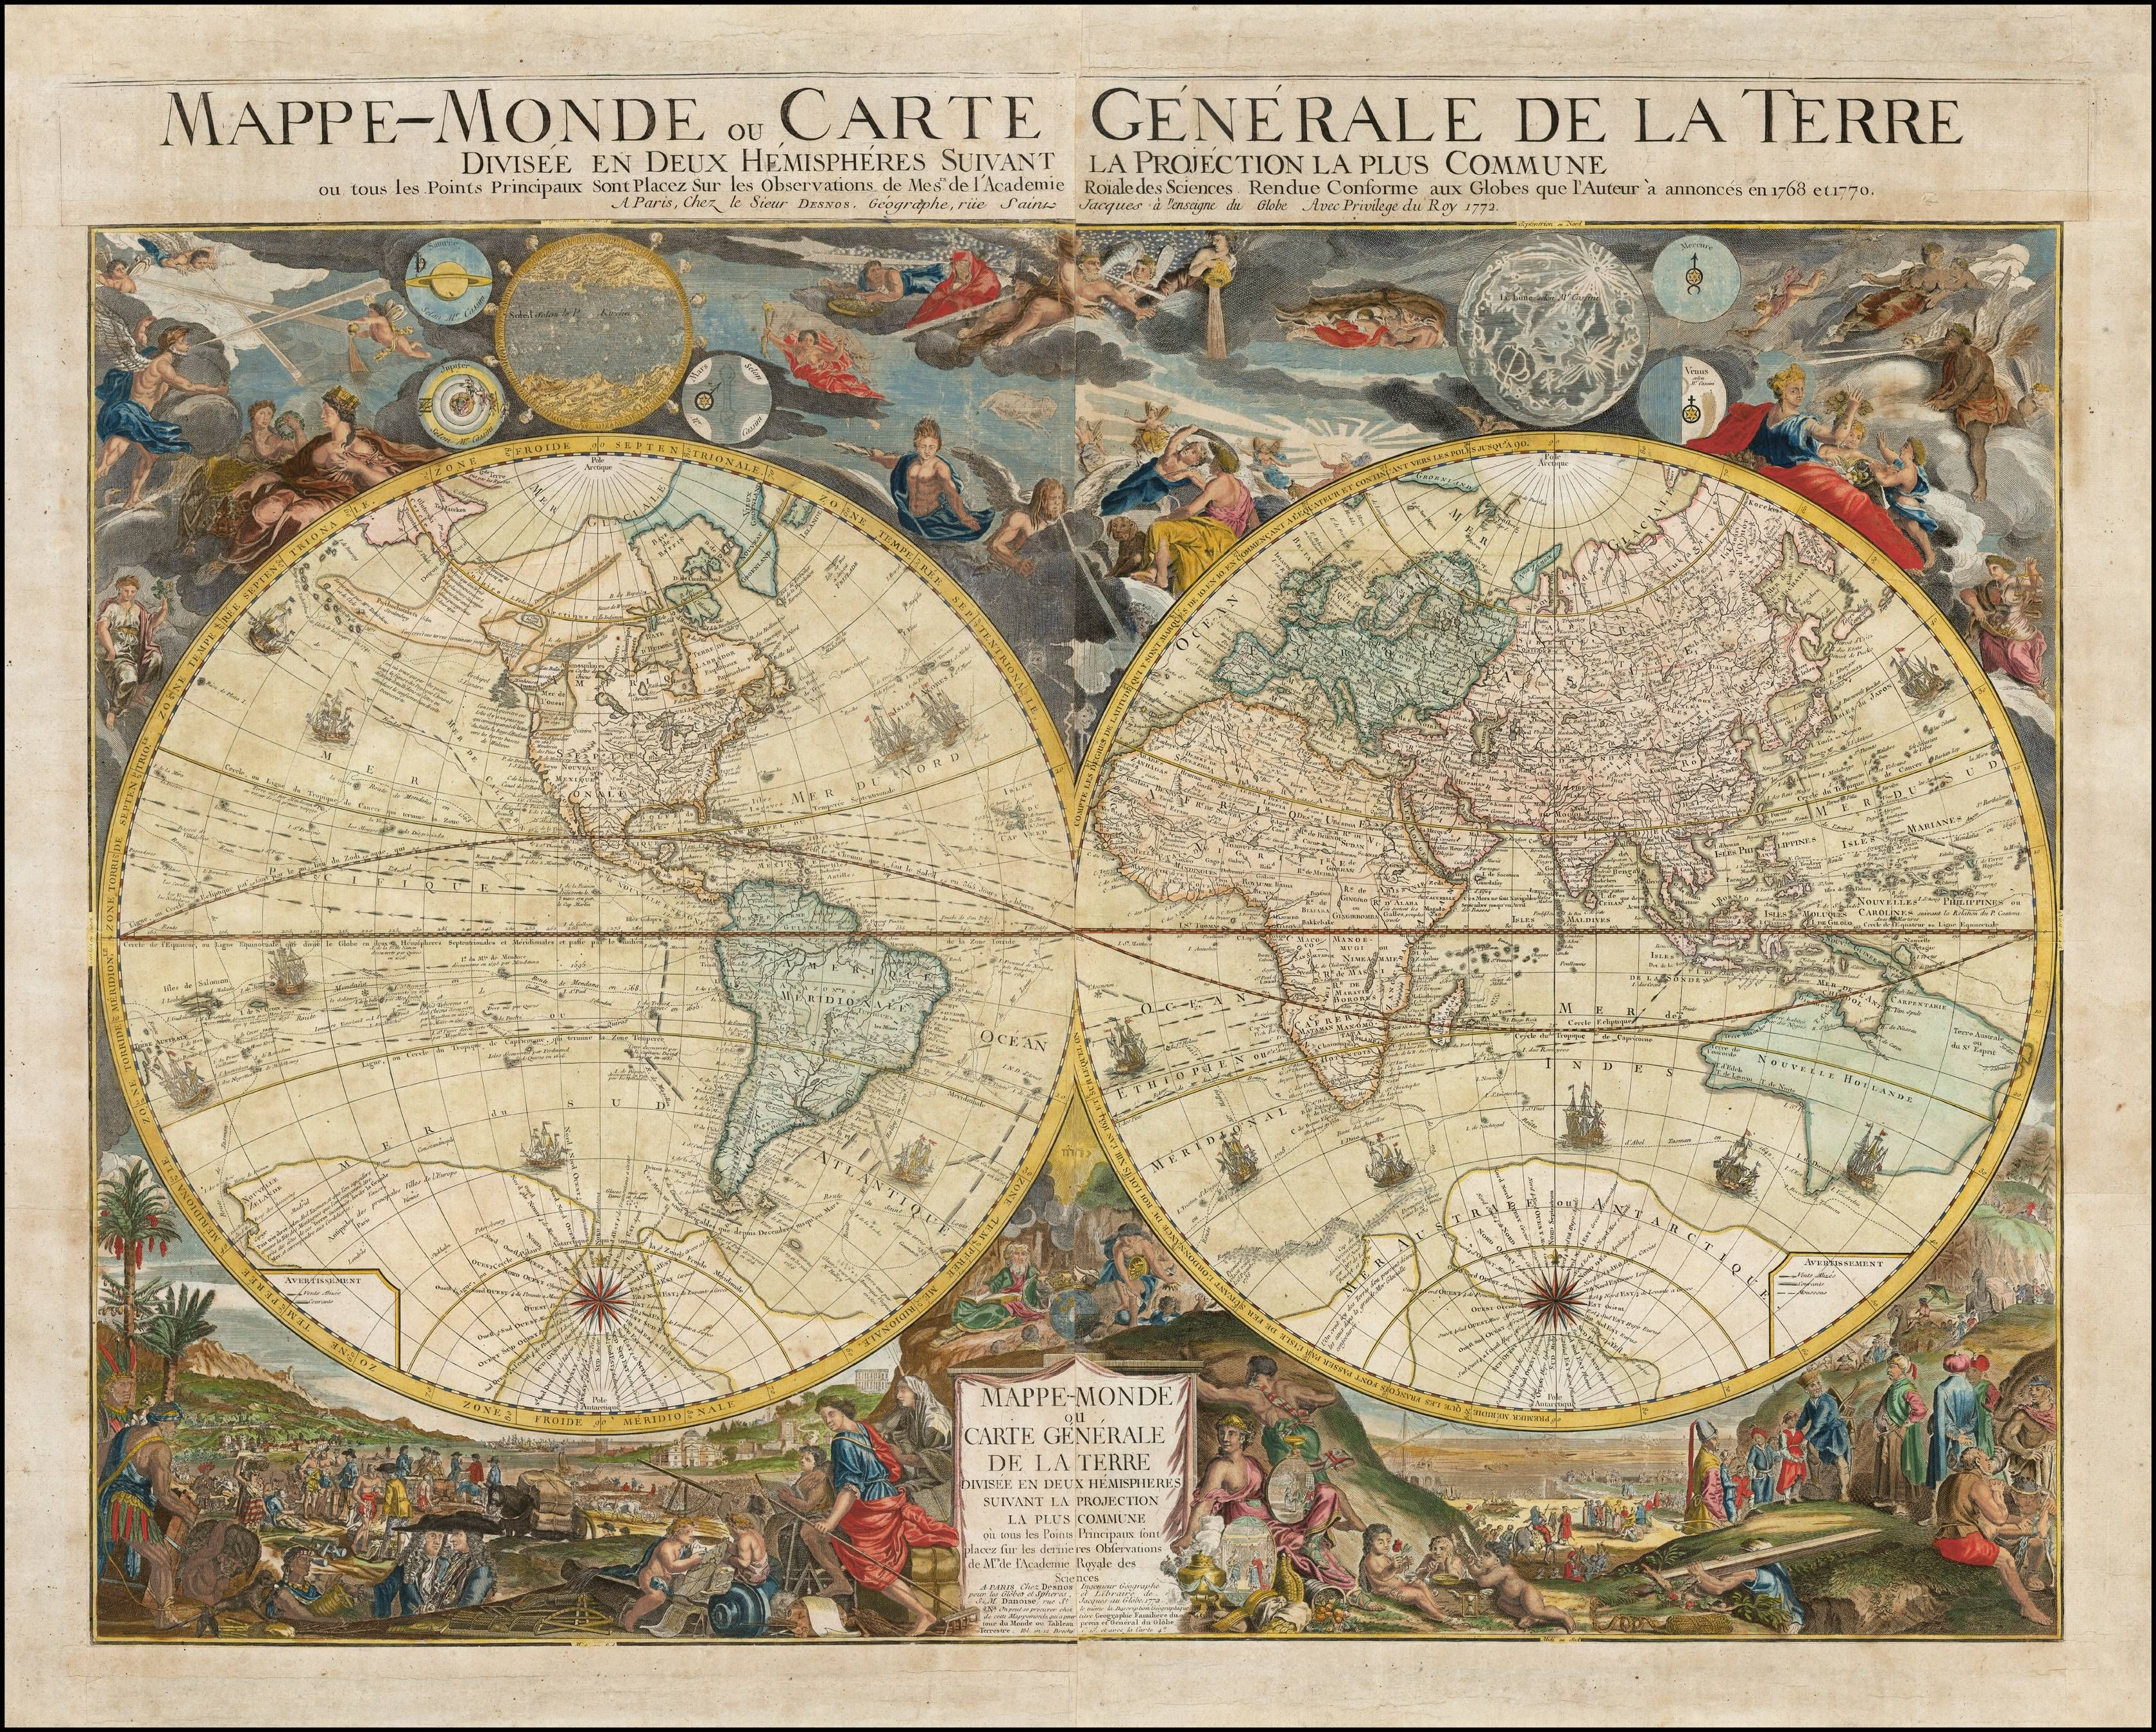 Desnos spectacular double hemisphere world map from 1772 with an desnos spectacular double hemisphere world map from 1772 with an extravagant and fictitious australian gumiabroncs Choice Image